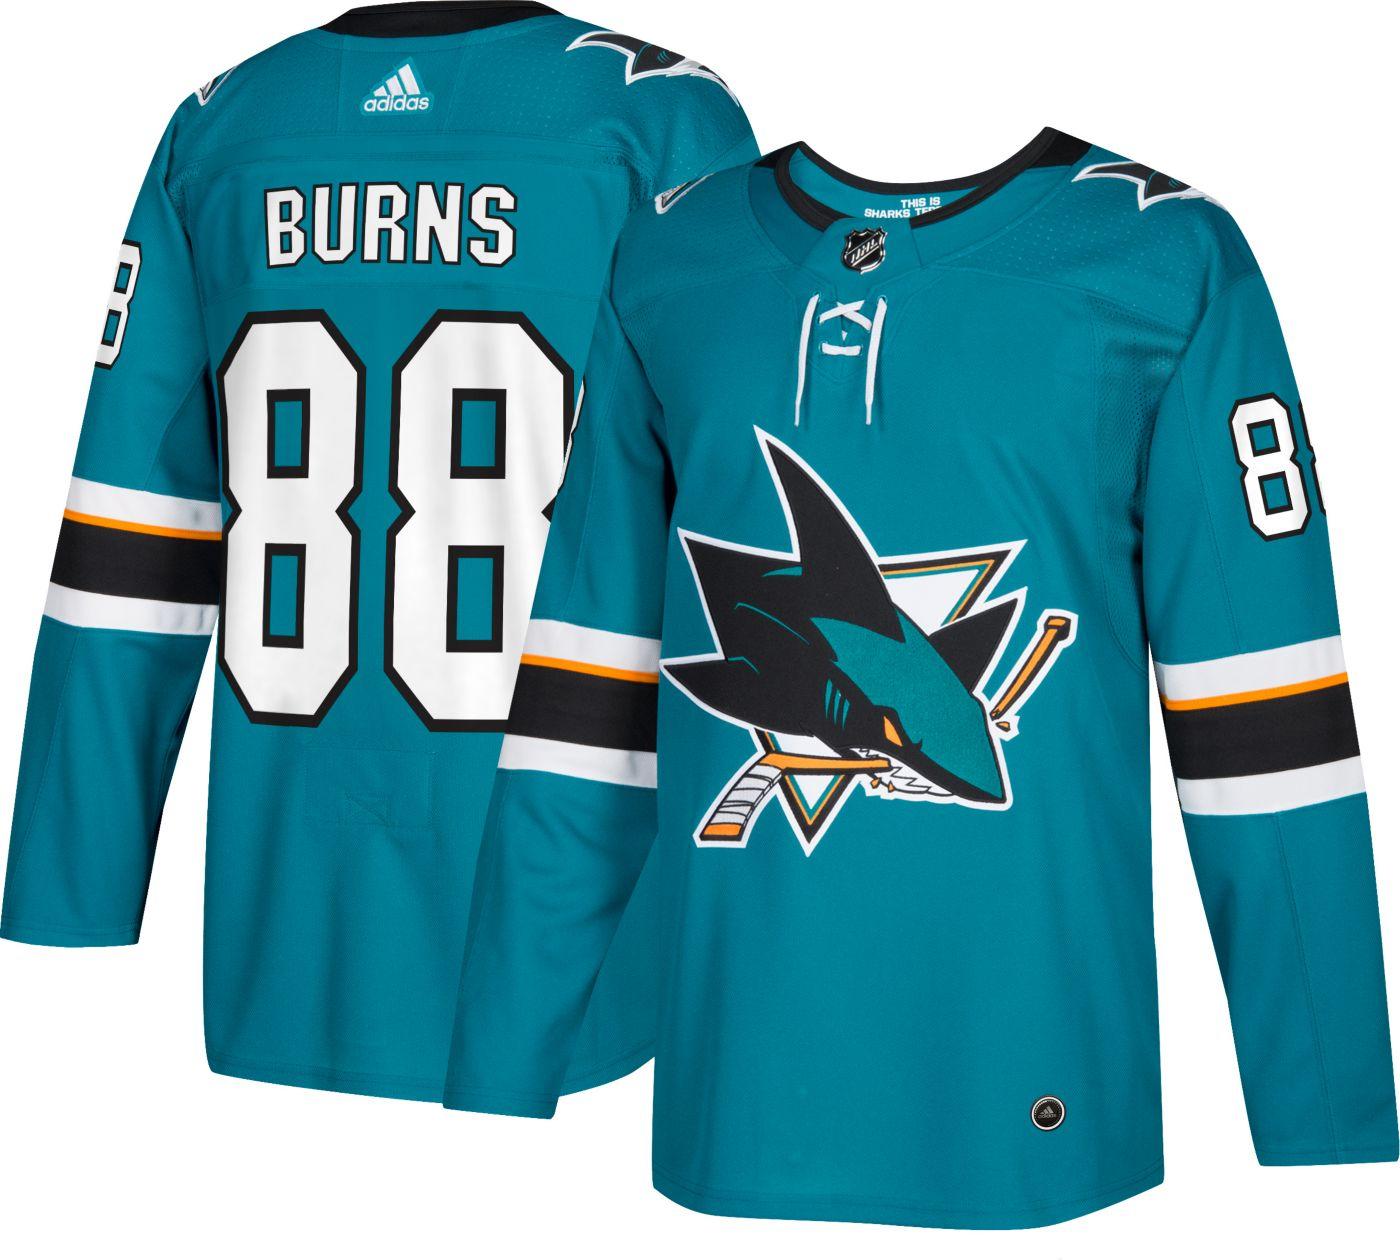 adidas Men's San Jose Sharks Brent Burns #88 Authentic Pro Home Jersey